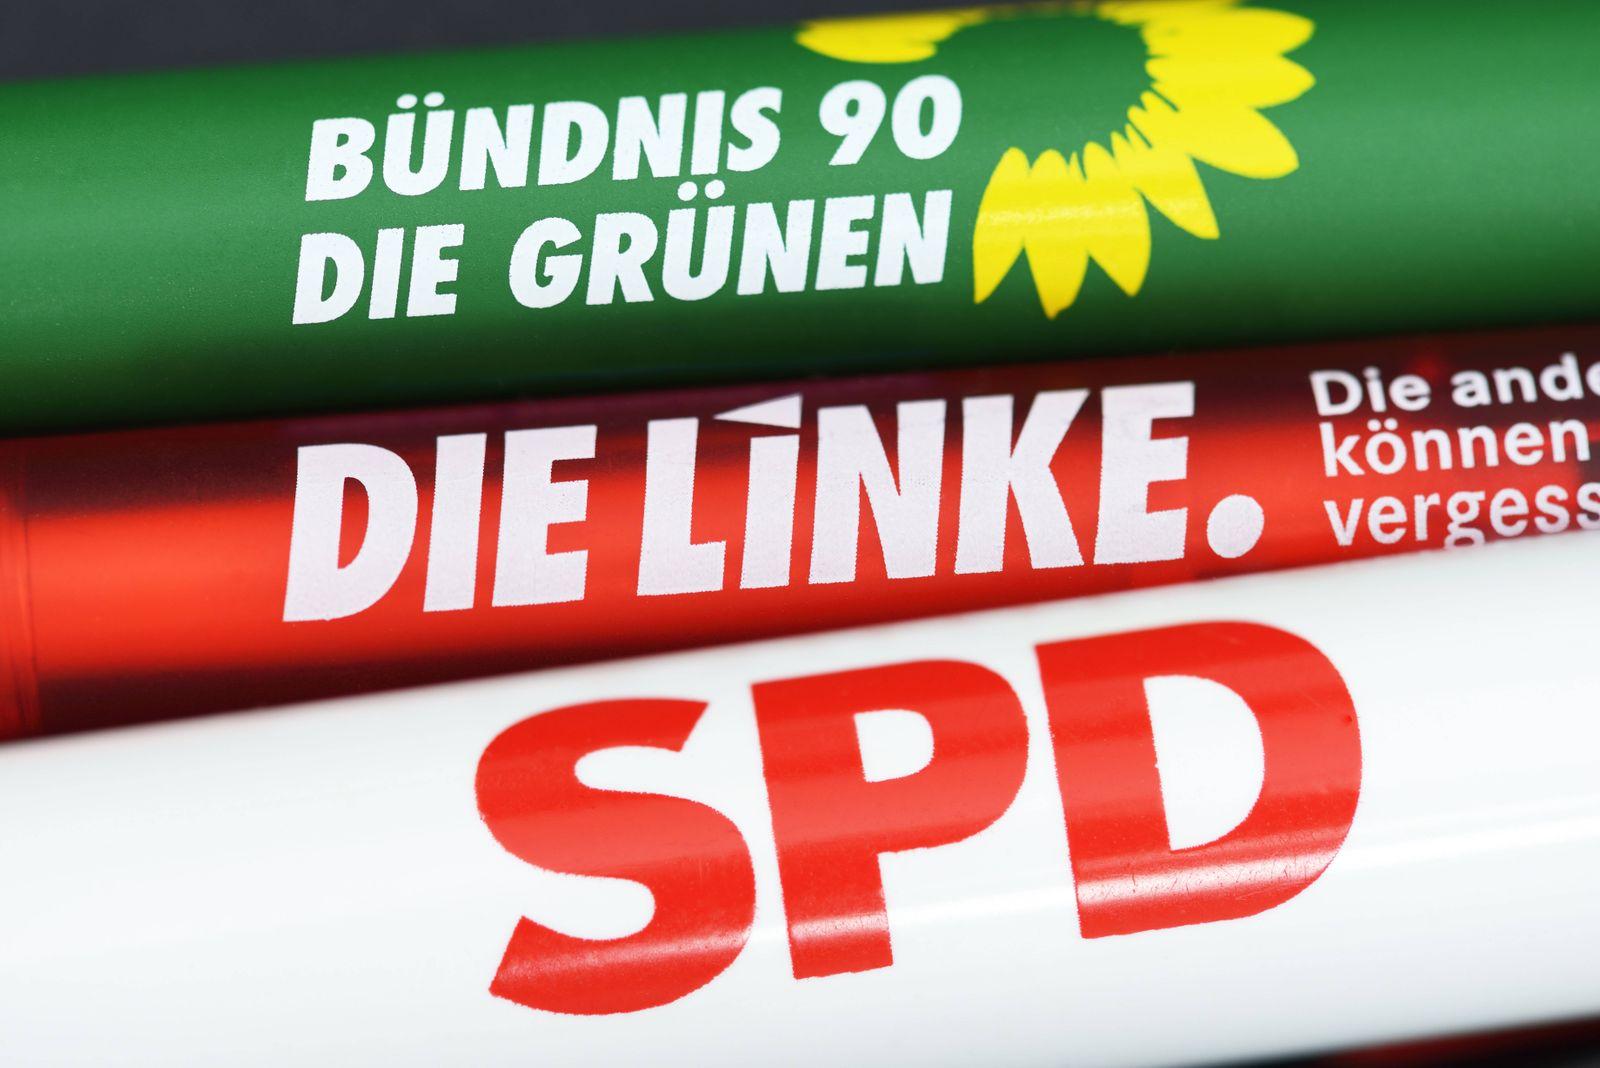 EINMALIGE VERWENDUNG R2G / rot-rot-grüne Koalition / SPD / Linke / Grüne